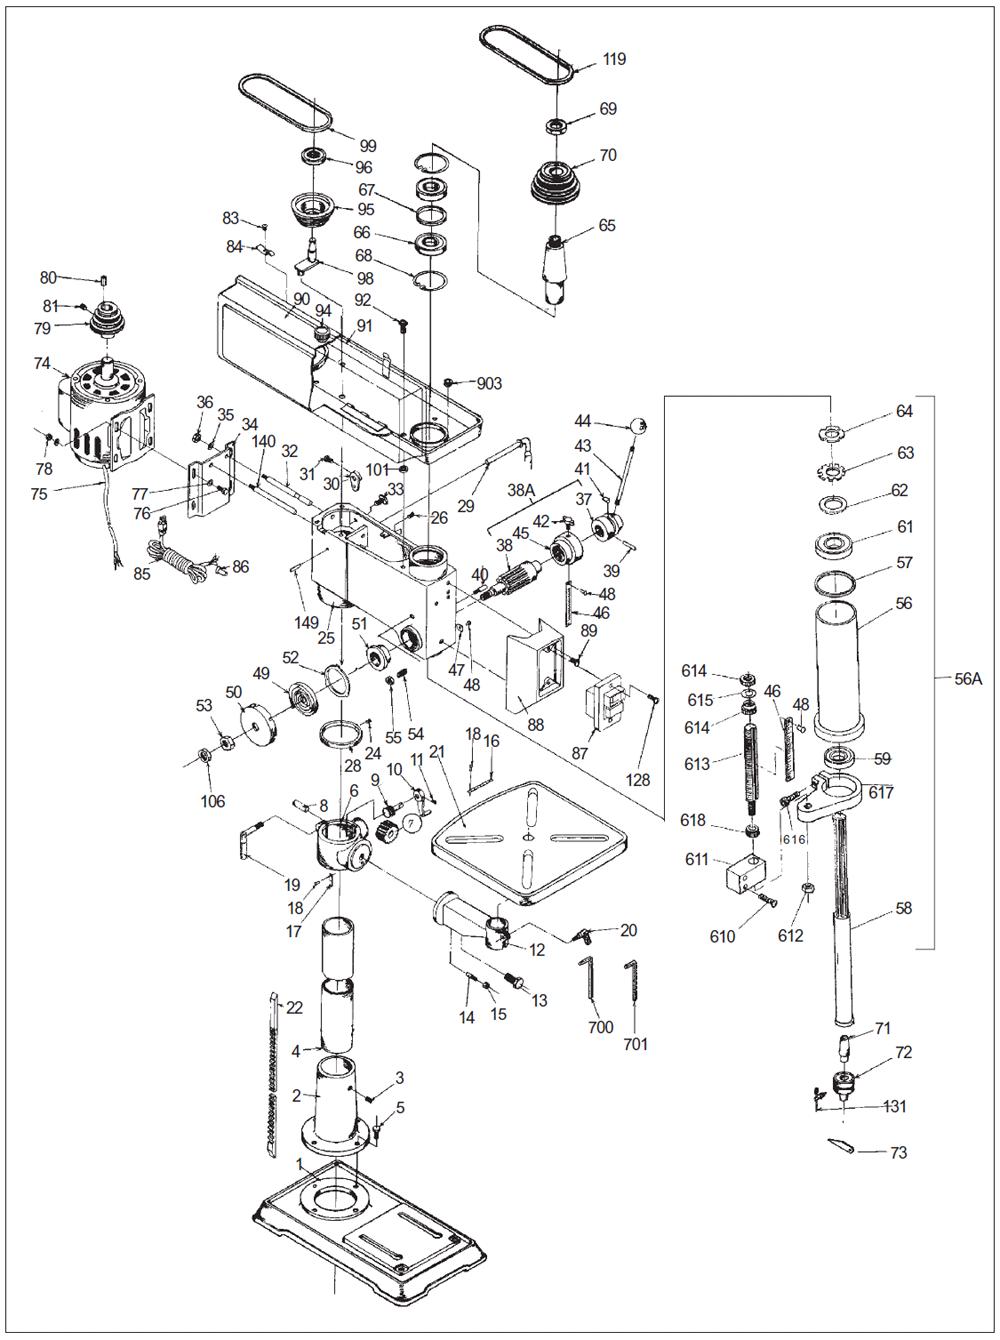 Dayton Drill Press Wiring Diagram Drill Press Operation